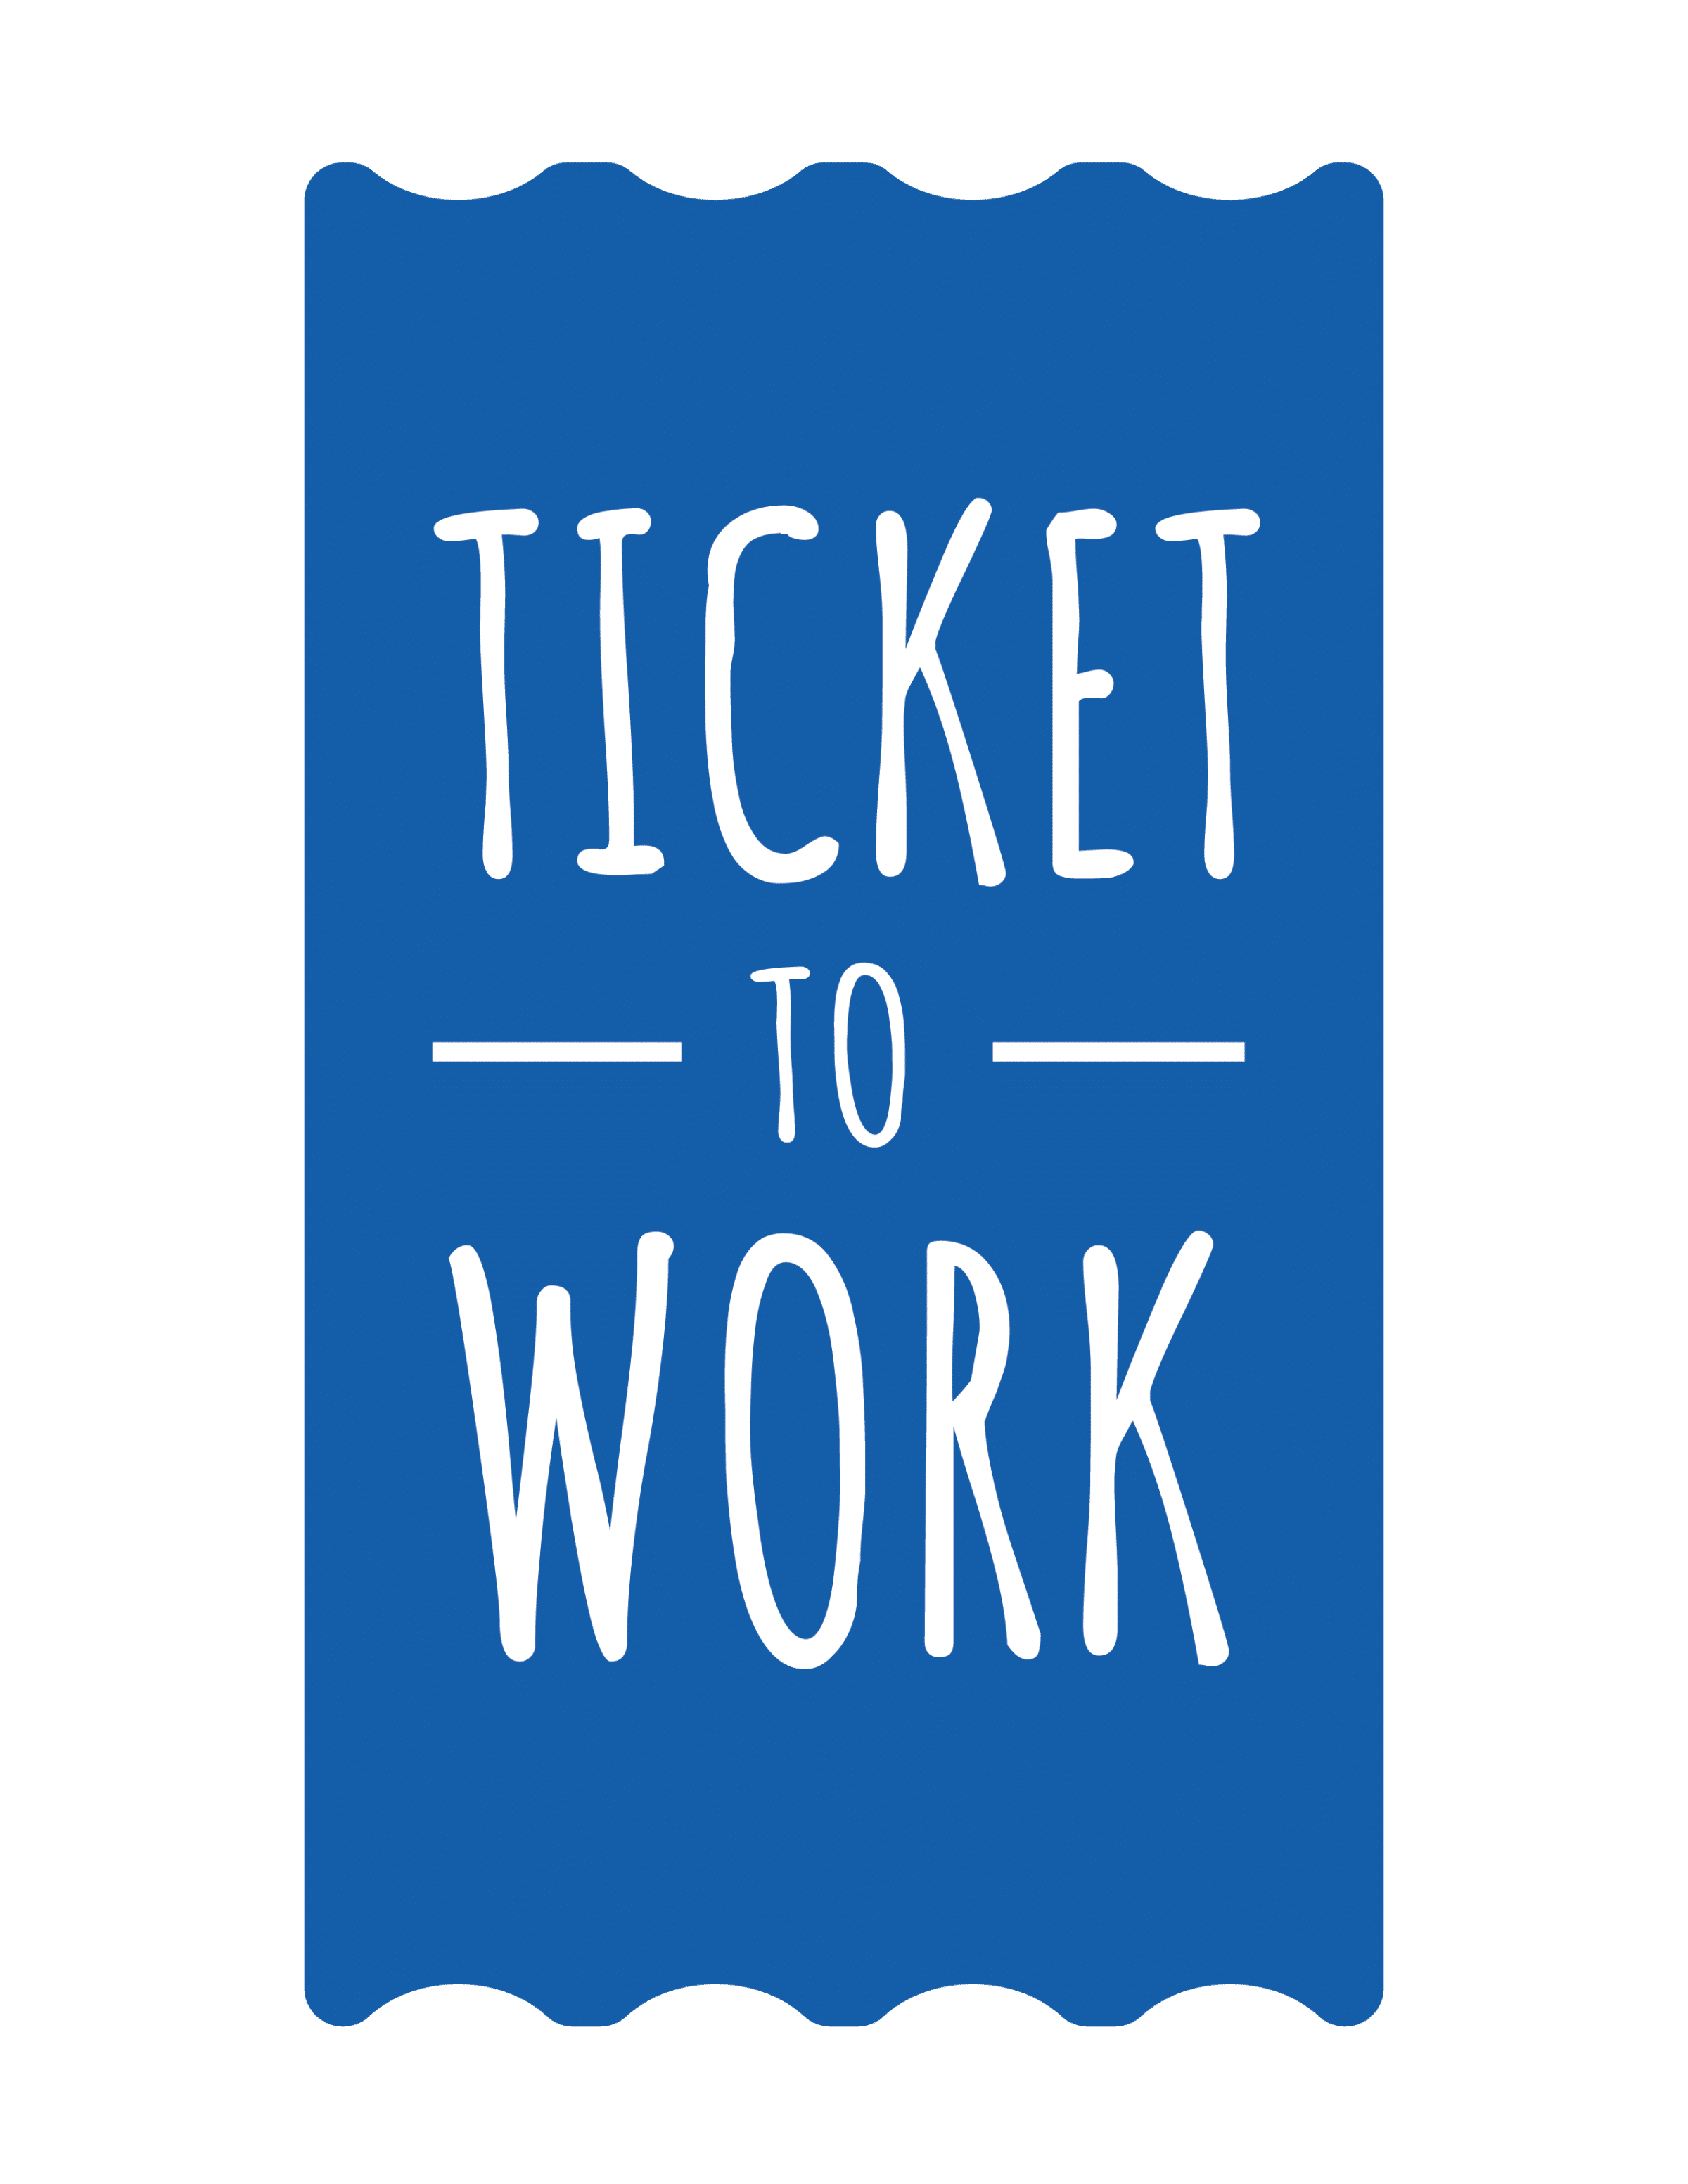 ticket to work logo bluebg 01